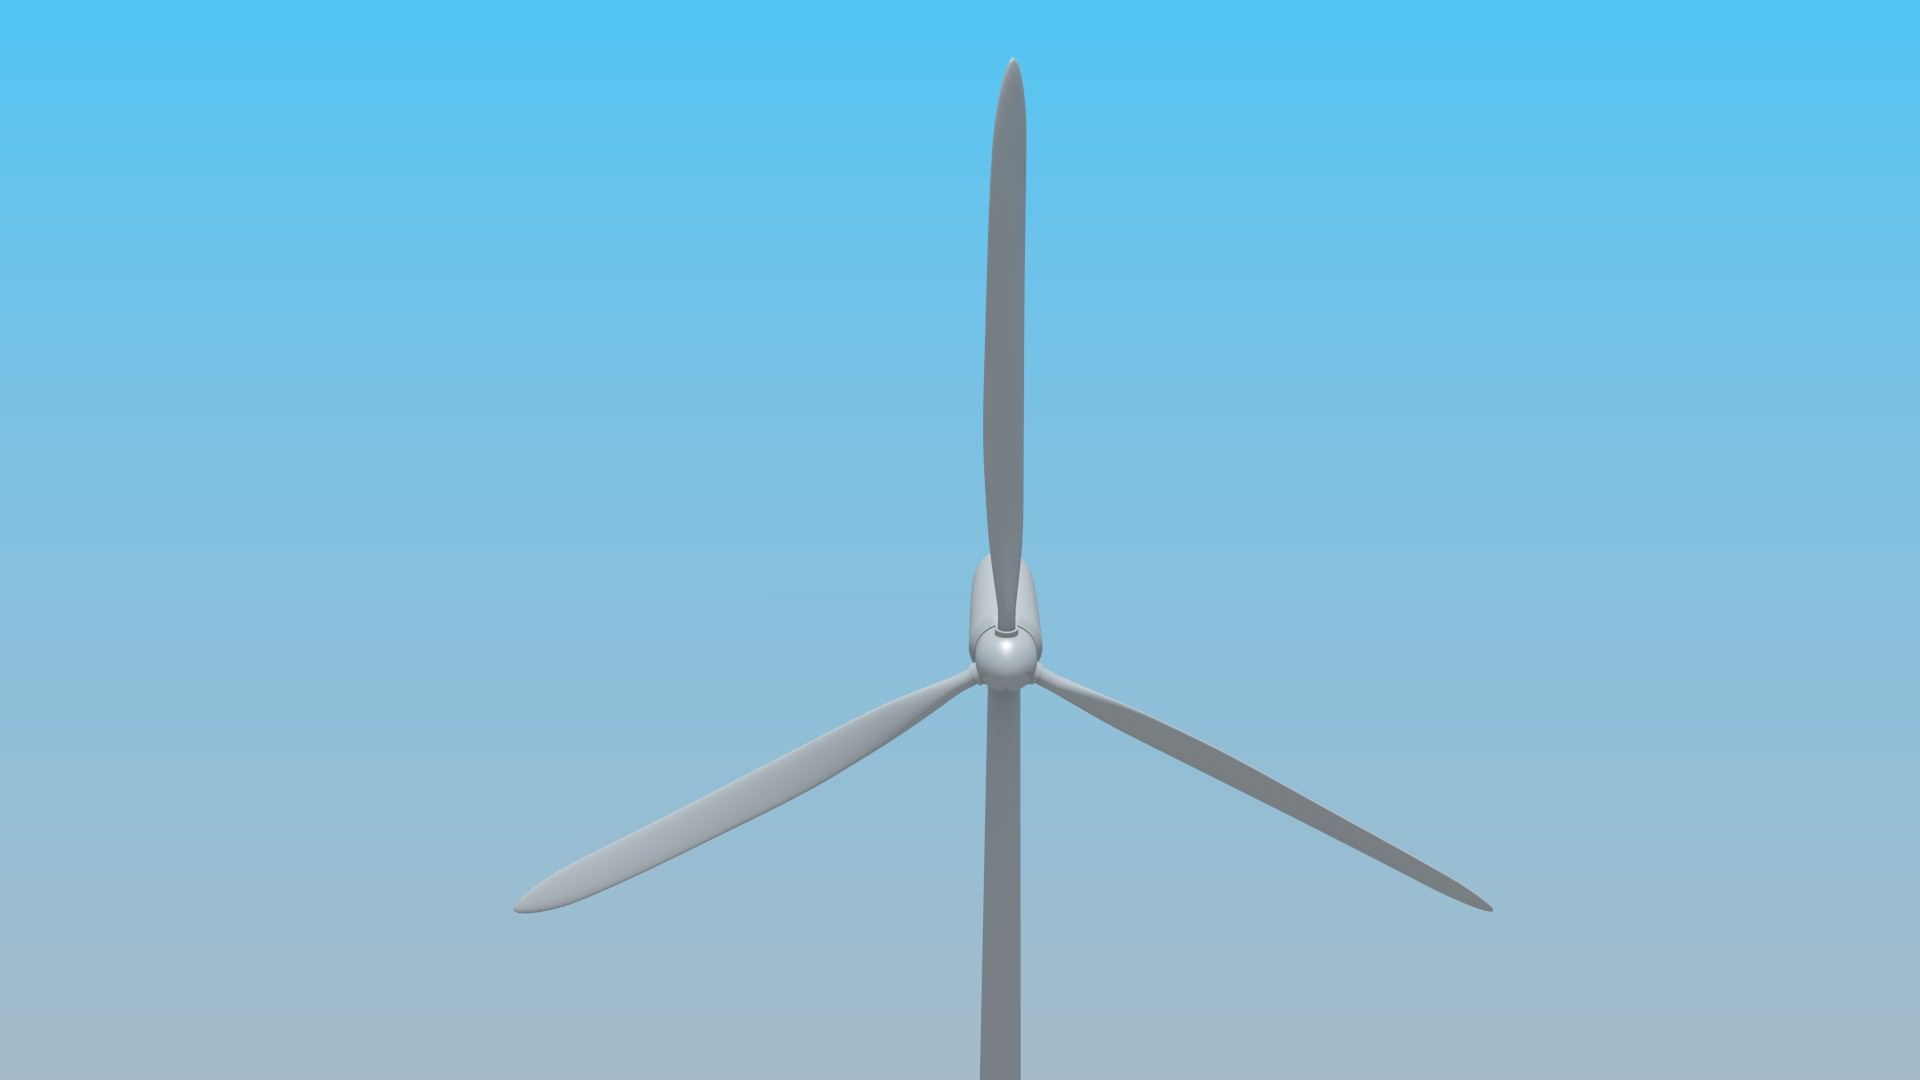 31k 0 description comments 0 wind turbine 3d model a wind turbine ...